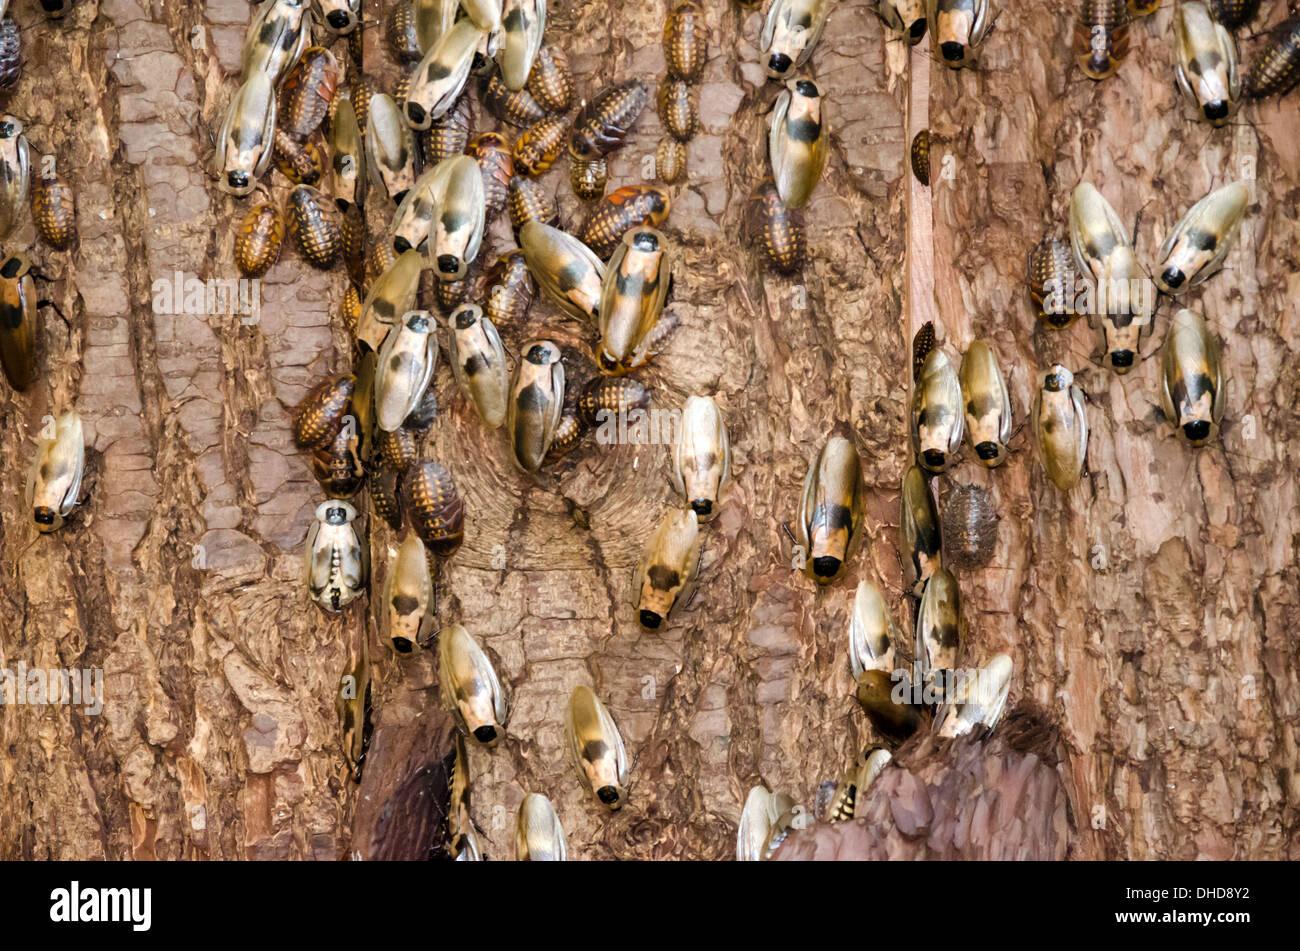 Cockroaches on tree bark - Stock Image